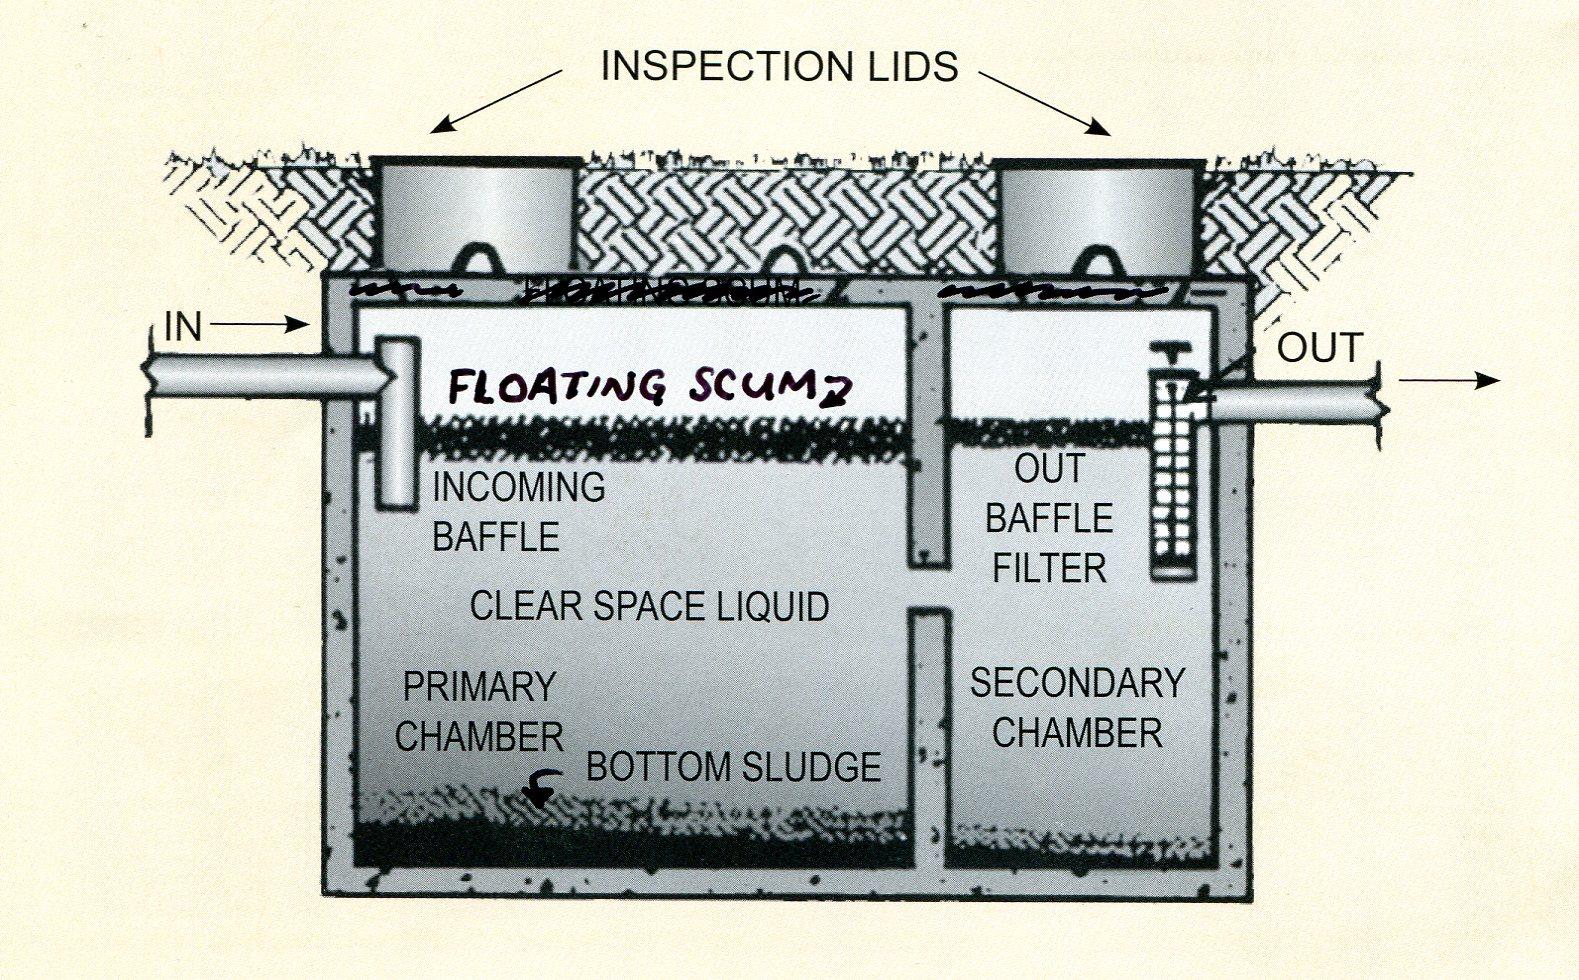 Septic tank, Septic system, Johnson's Sanitation